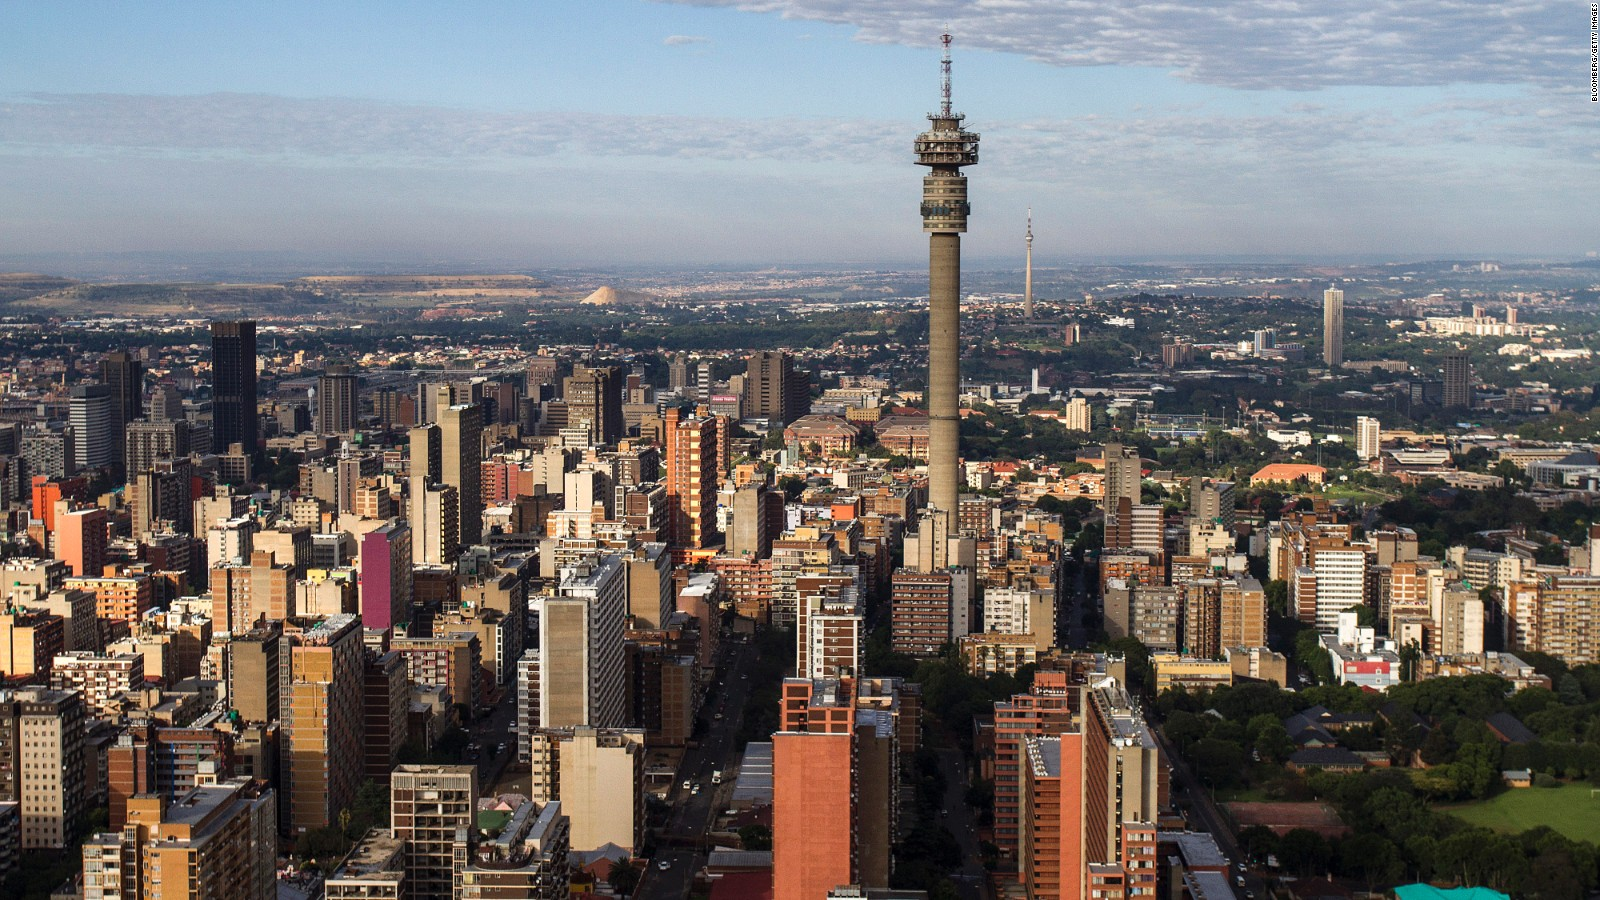 Johannesburg tourism emerging from cape towns shadow cnn travel altavistaventures Choice Image